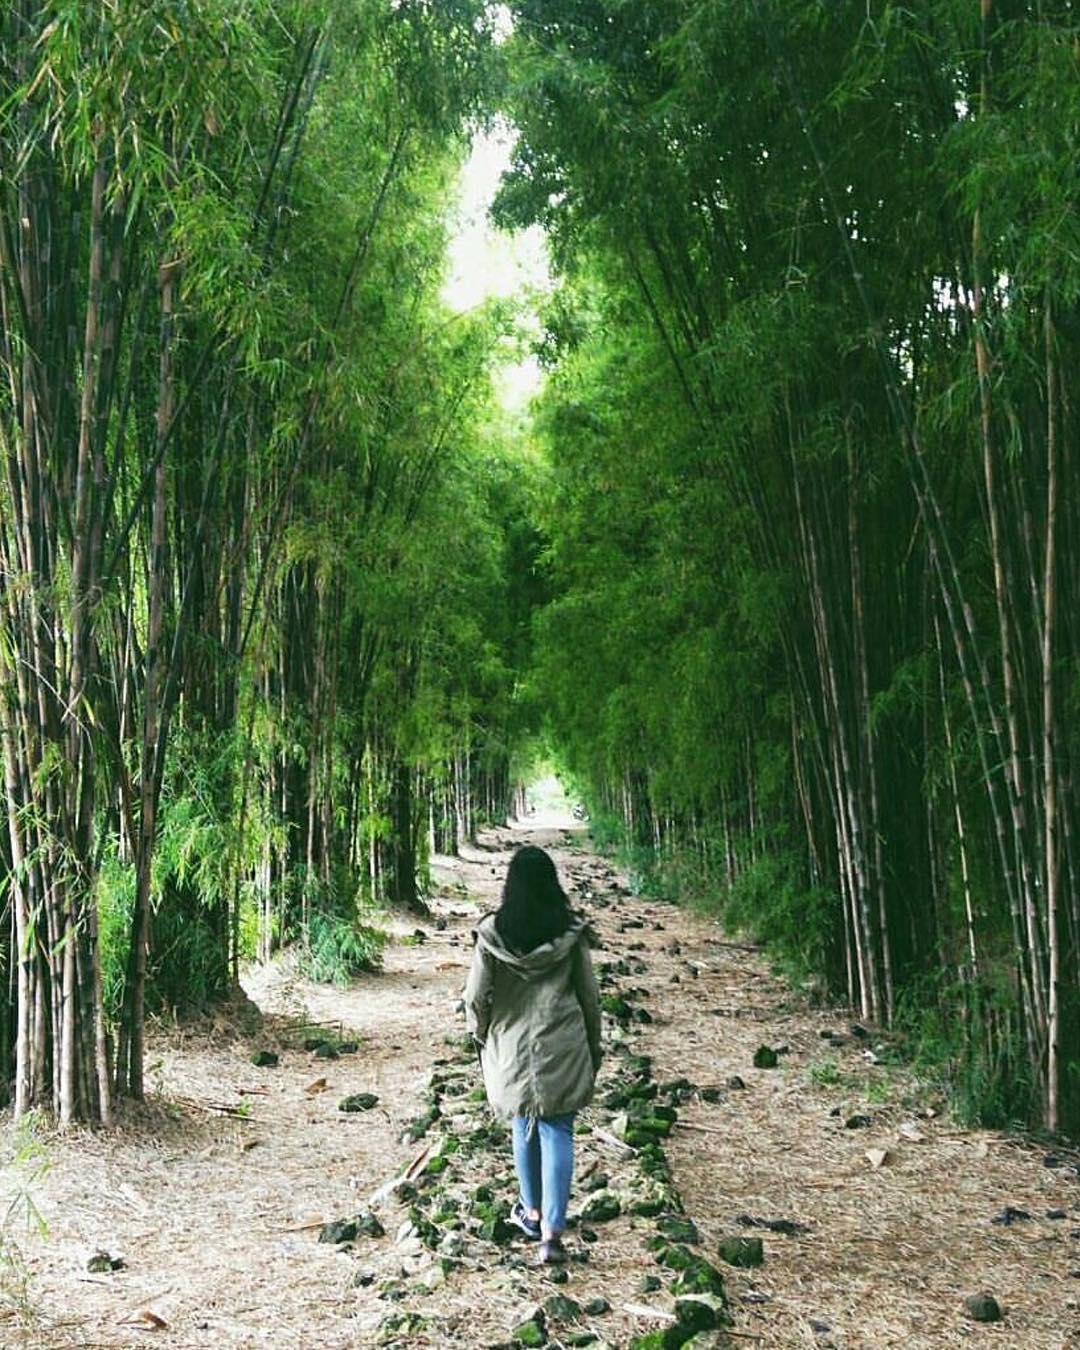 Taman Sakura Keputih Surabaya, Taman Sakura Surabaya, Taman Sakura Keputih, Taman Harmoni, Surabaya, Dolan Dolen, Dolaners taman harmoni keputih - Dolan Dolen